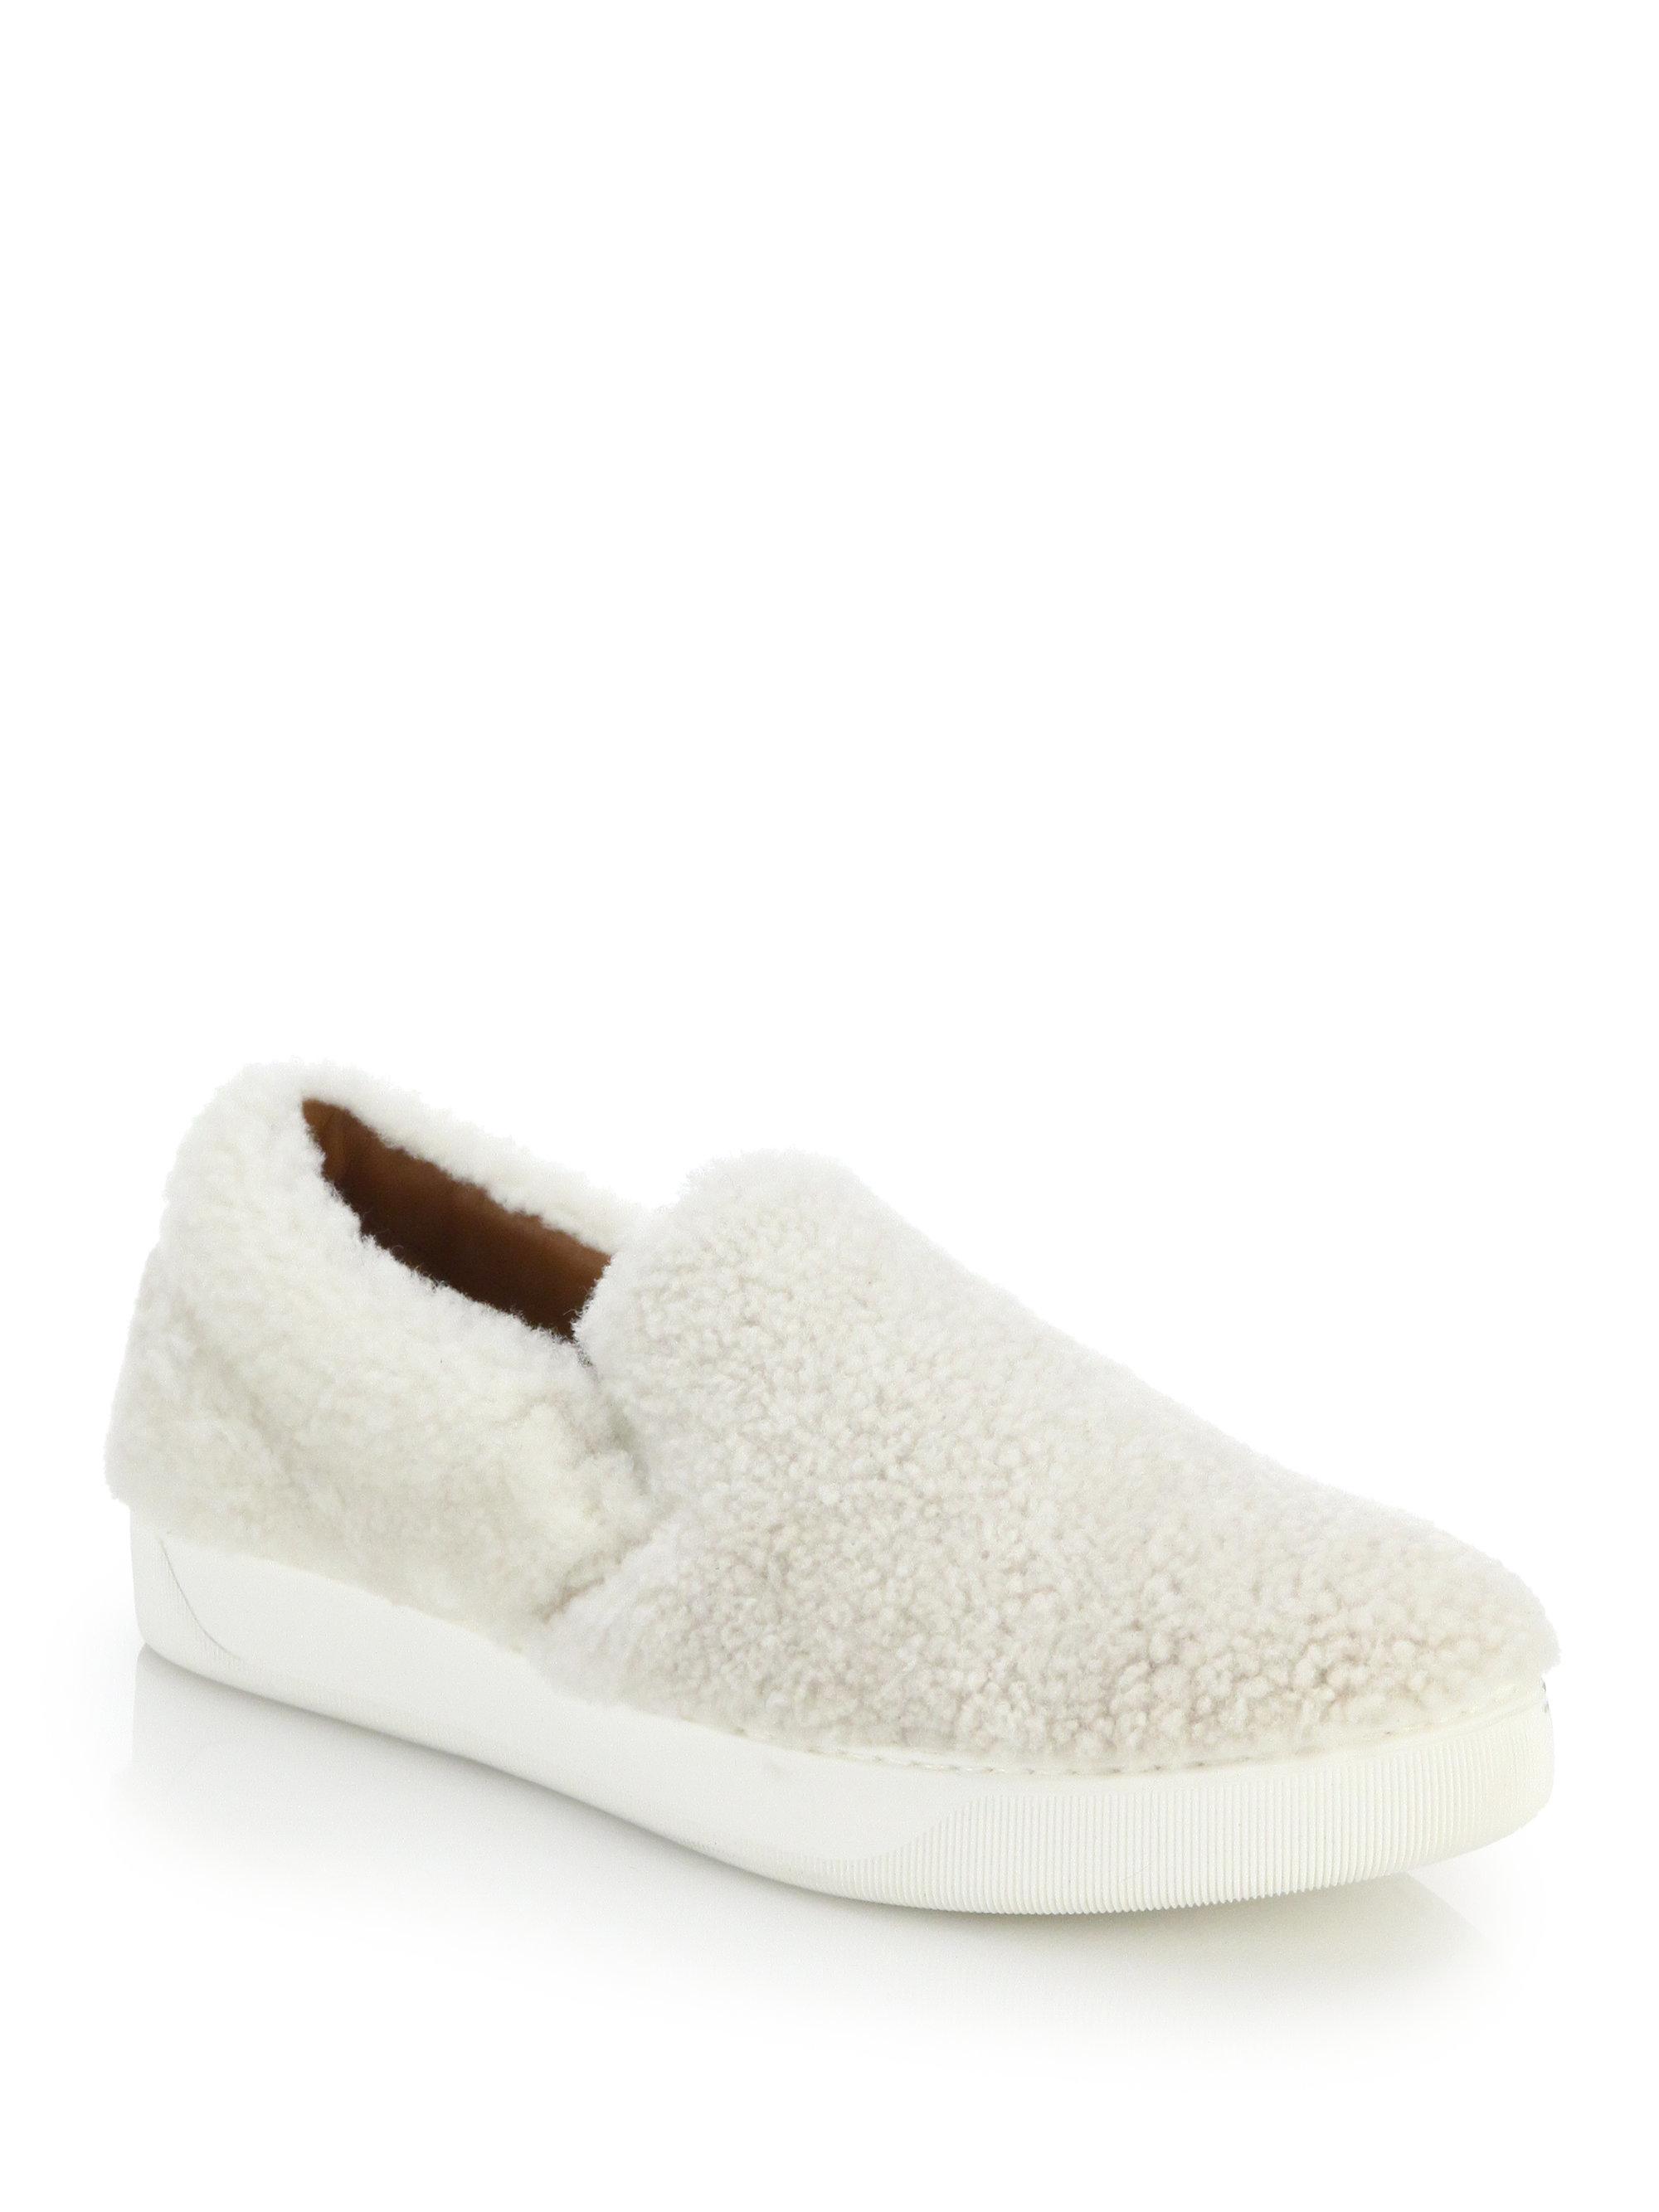 Moncler Roseline Lamb Fur U0026 Leather Slip-on Sneakers In ...